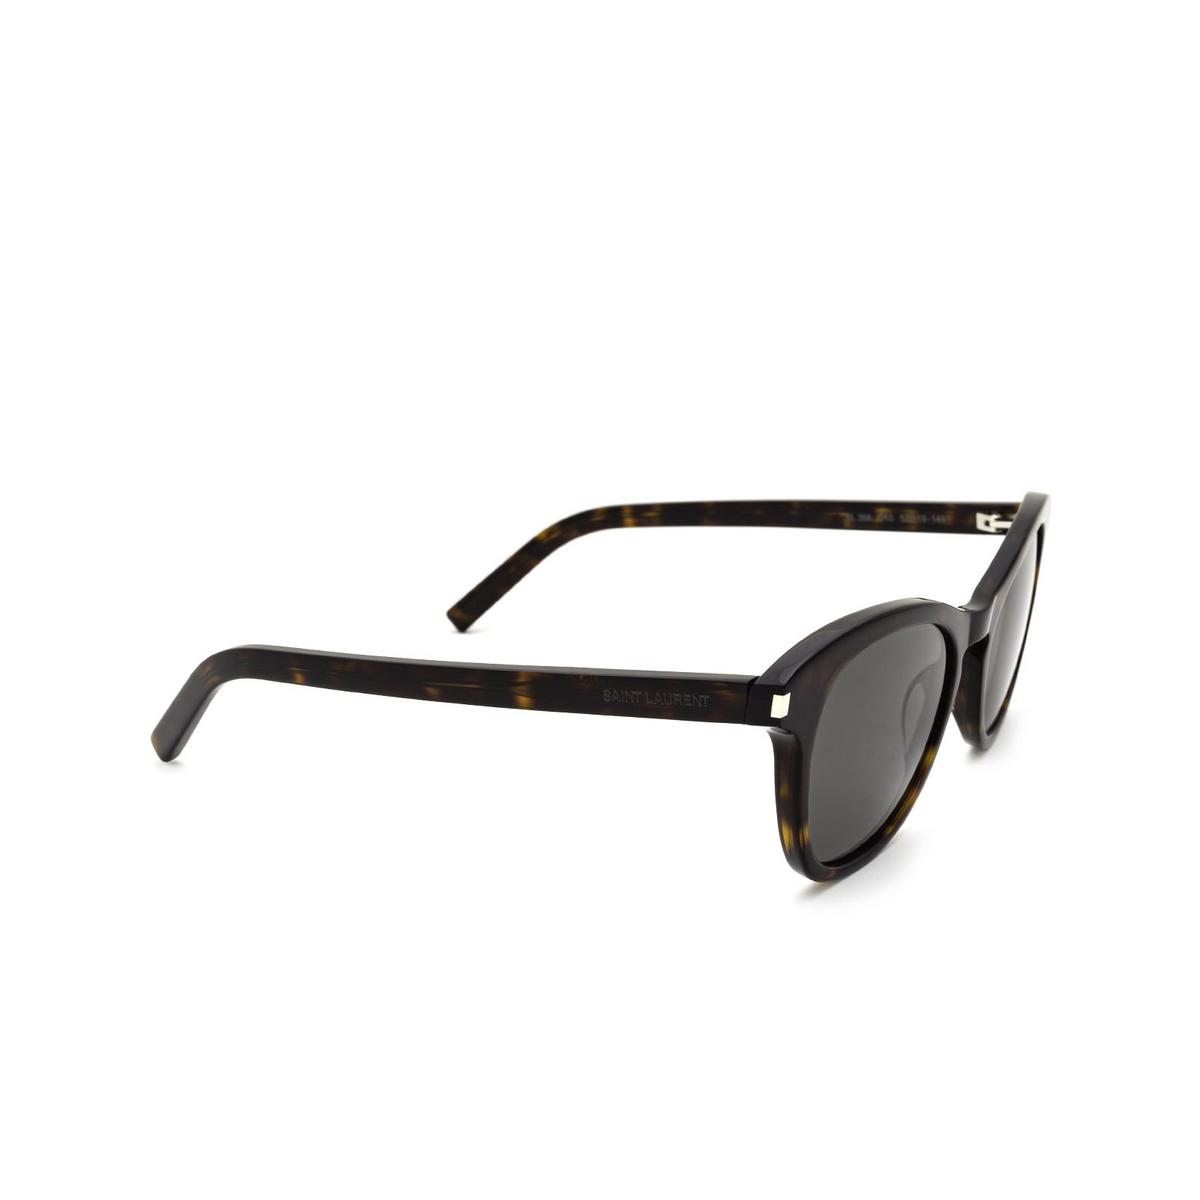 Saint Laurent® Cat-eye Sunglasses: SL 356 color Dark Havana 010 - three-quarters view.